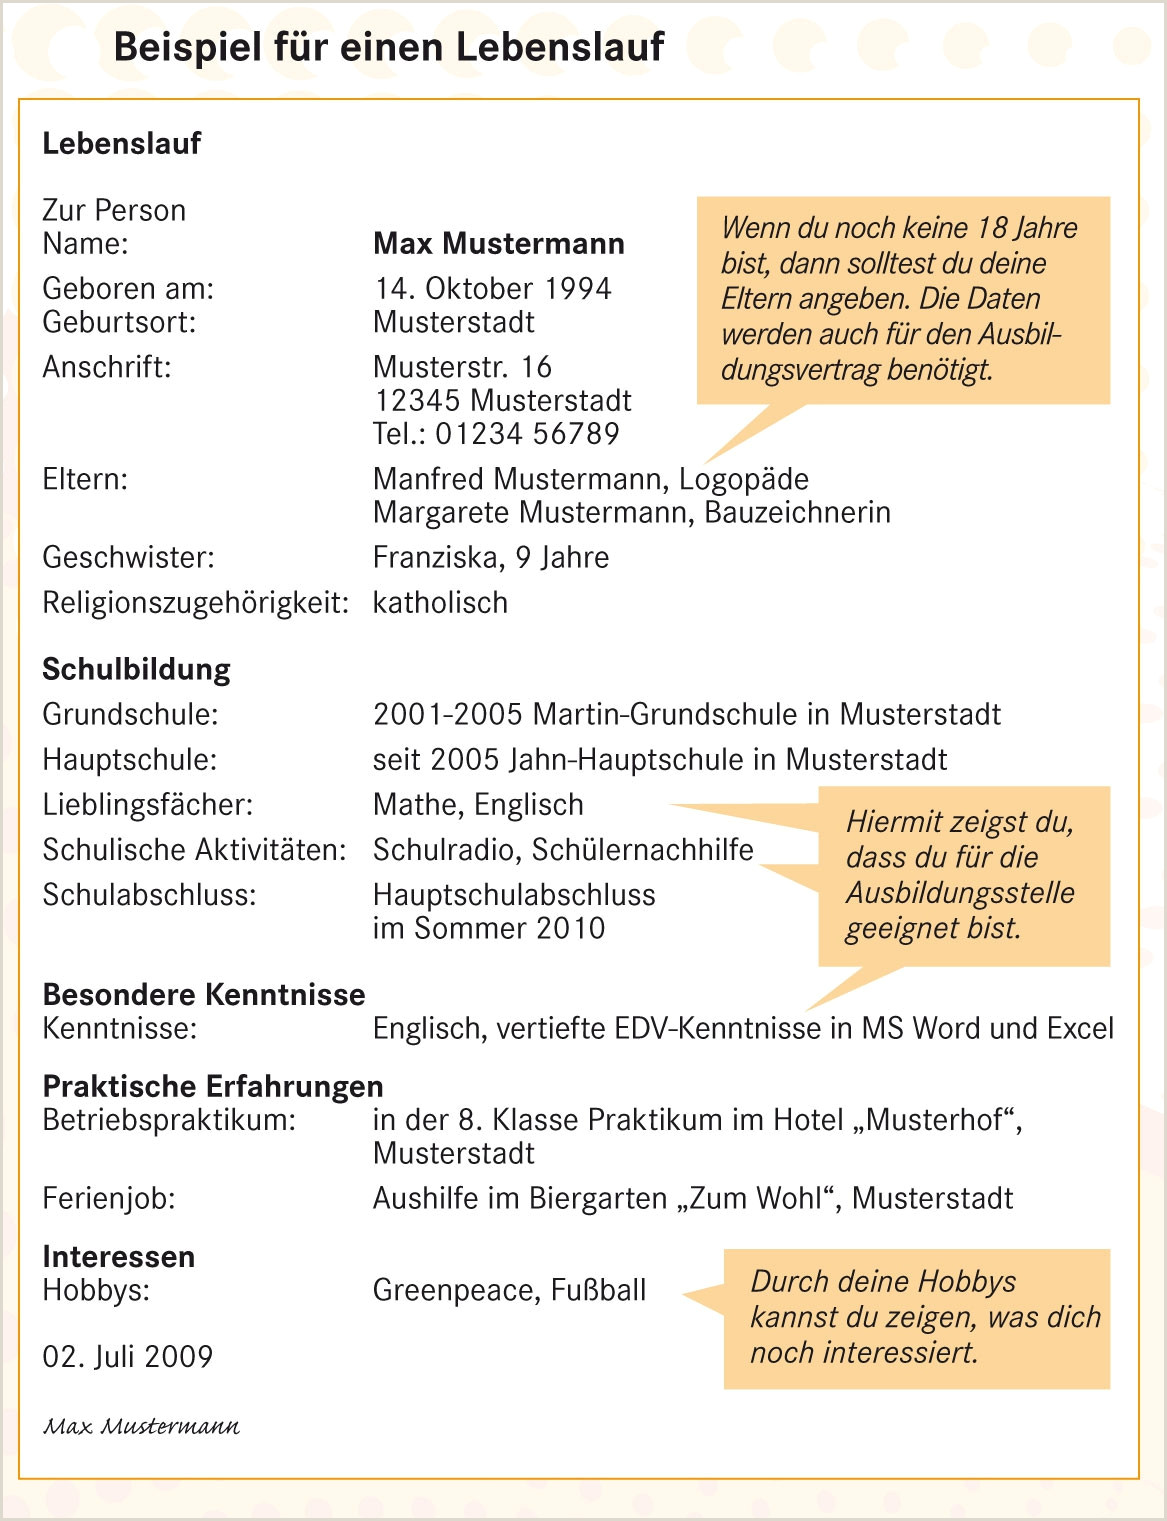 Lebenslauf Muster Hobbys Interessen 12 Max Mustermann Lebenslauf